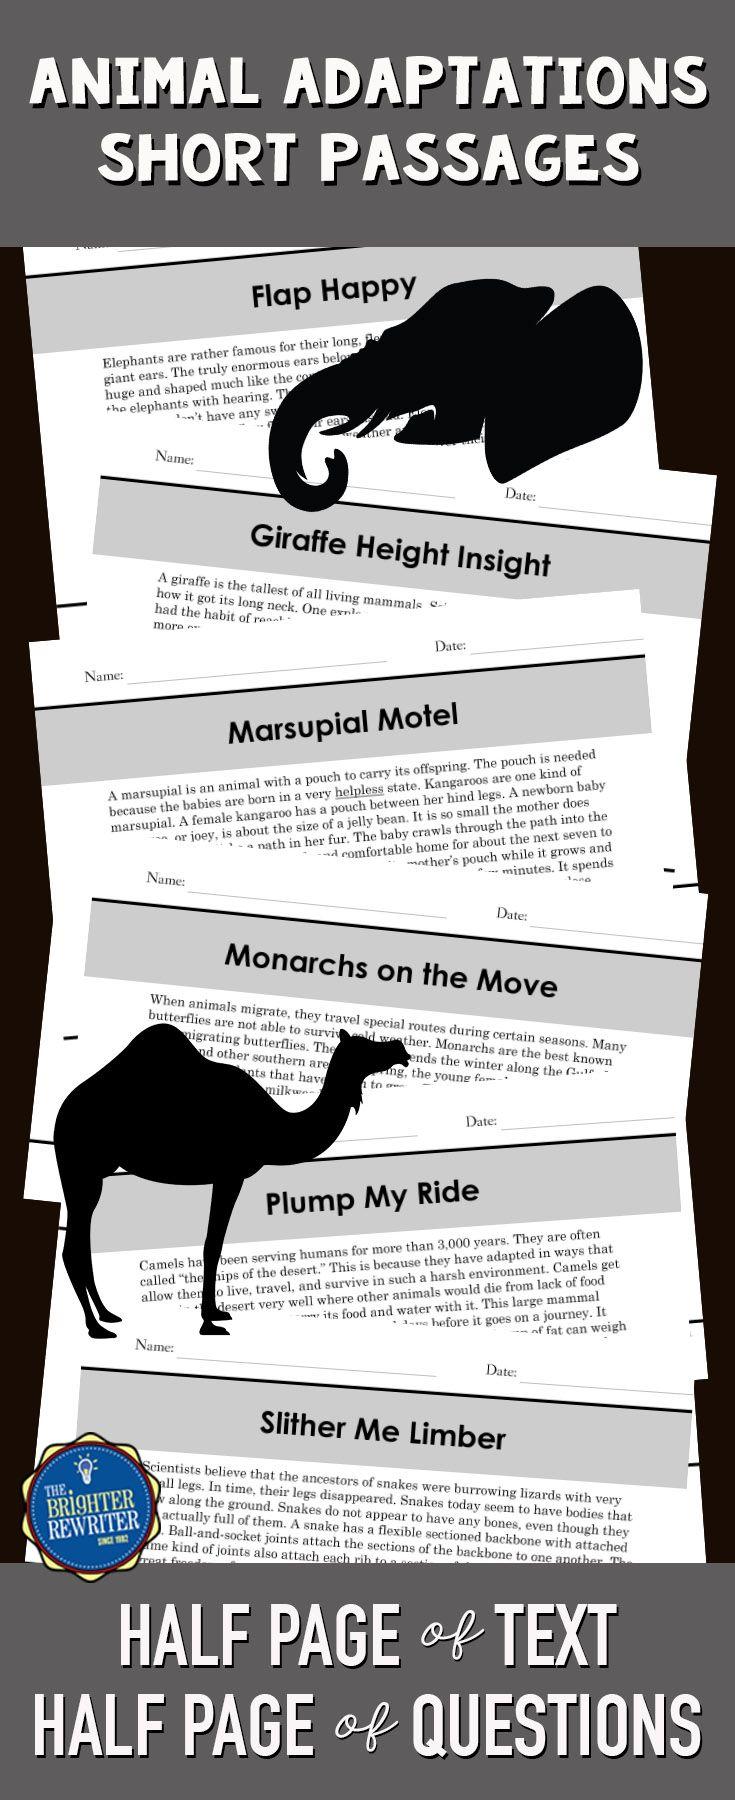 Animal Adaptations Reading Comprehension Passages Set 1 Animal Adaptations Adaptations Animal Adaptations Reading Passages [ 1800 x 735 Pixel ]